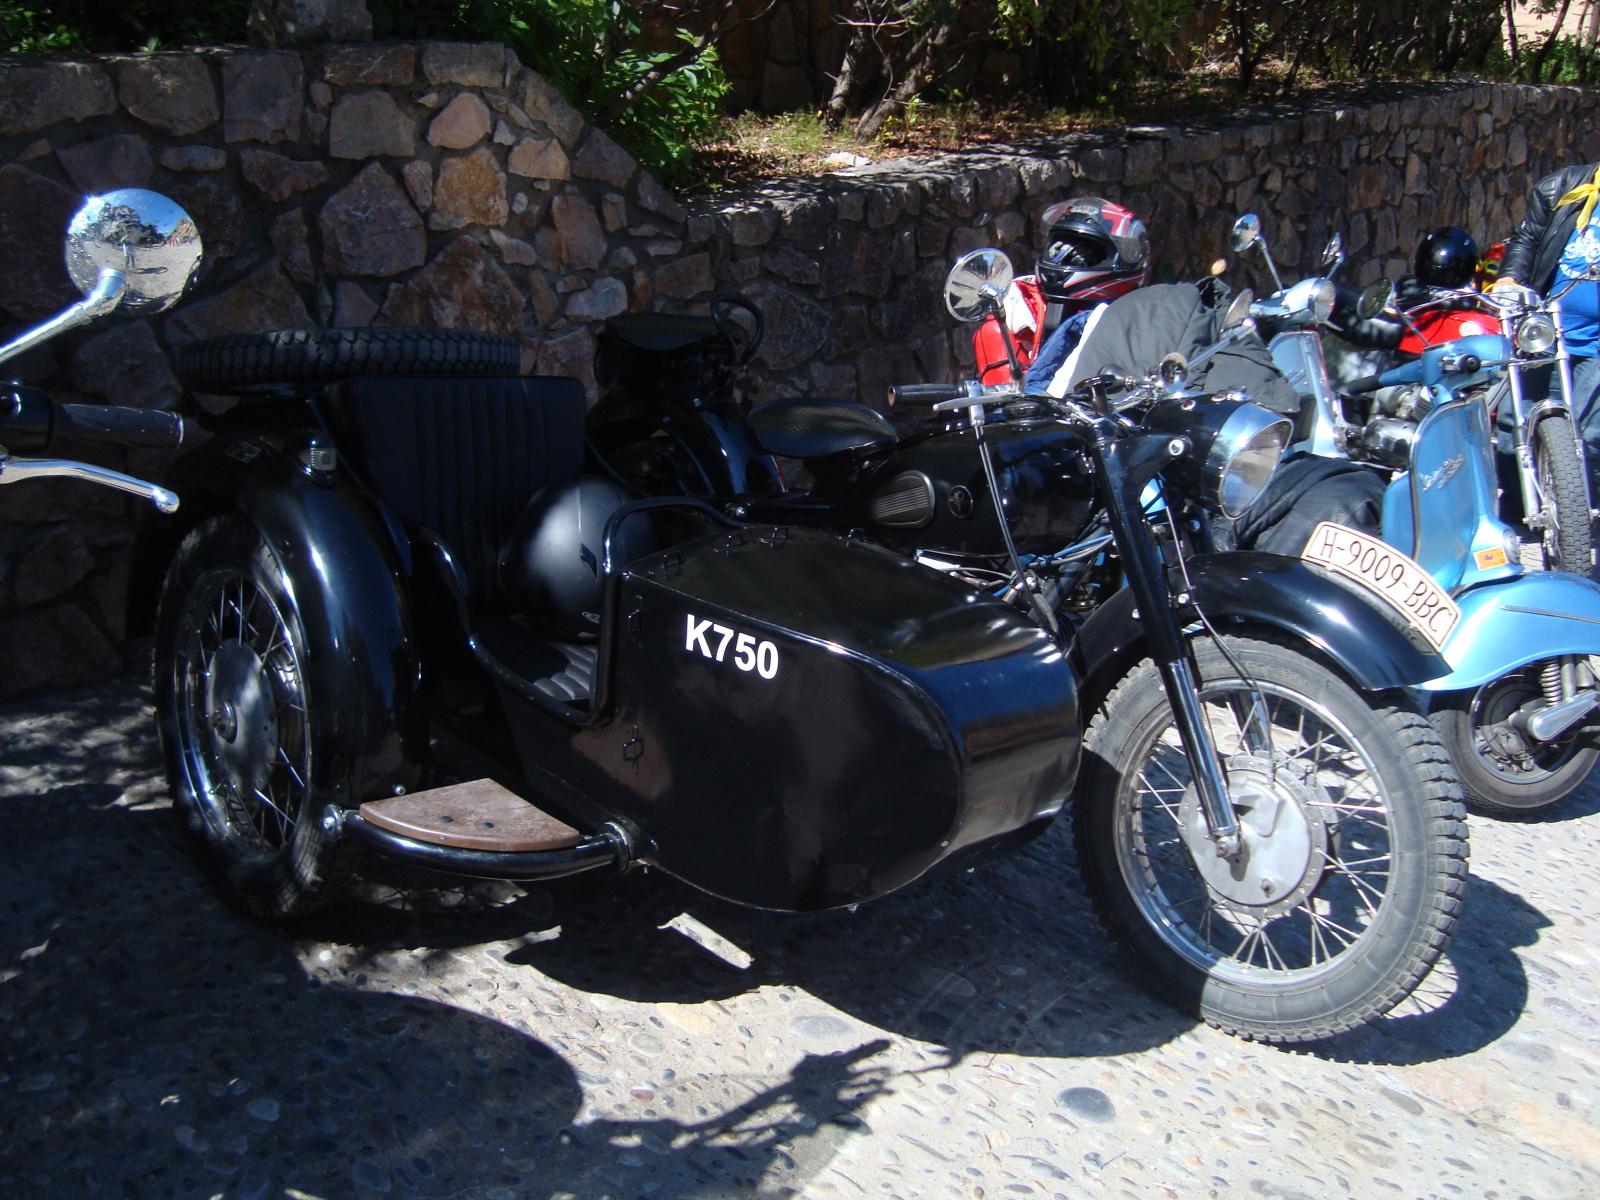 XI concentracion de motos antiguas en Alberuela de tubo (Huesca) 1zz13pl